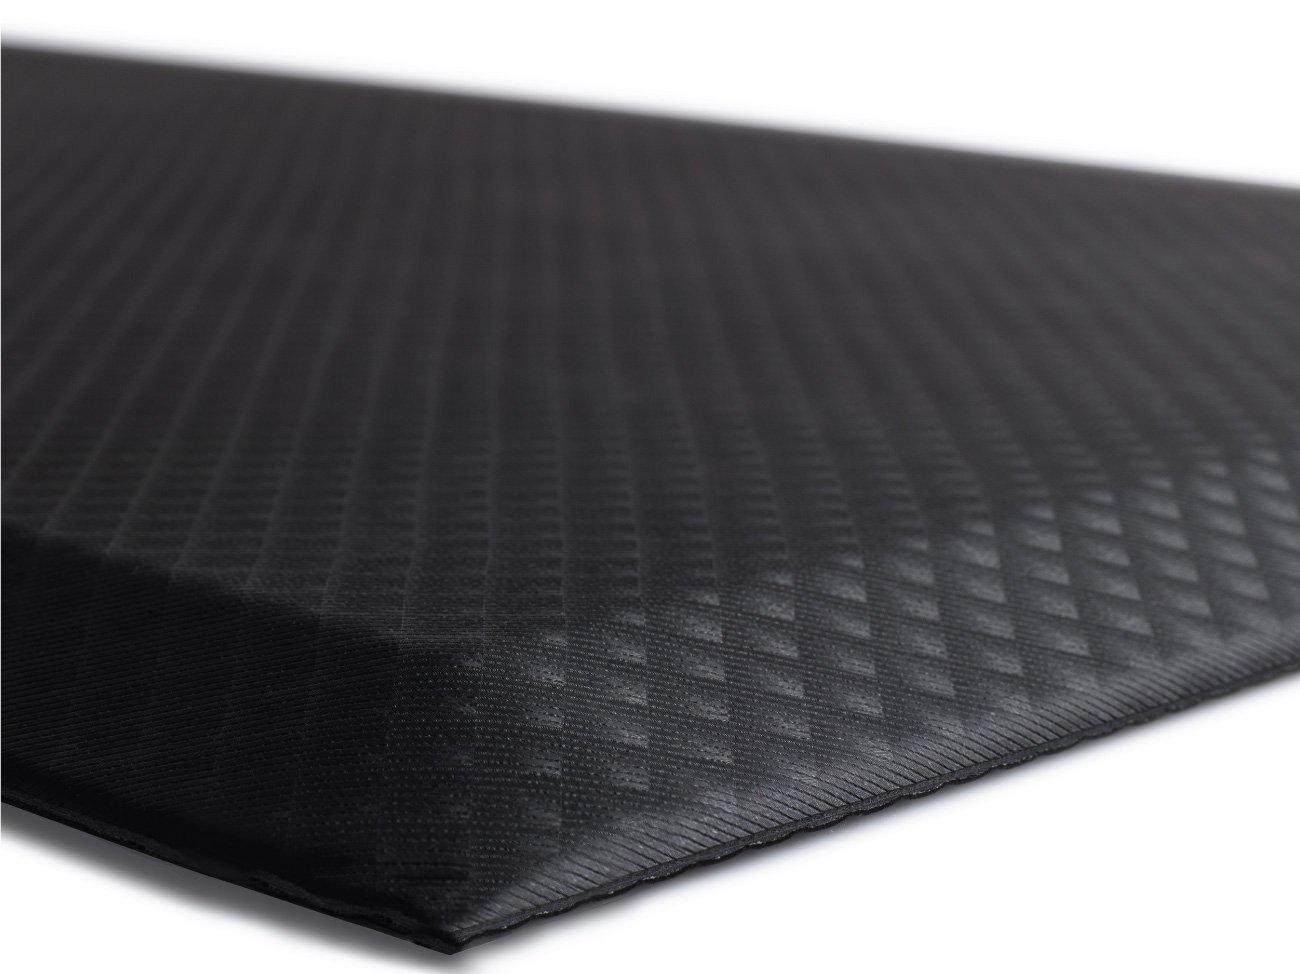 The Original 3/4'' KANGAROO (TM) Anti-Fatigue Comfort Mat Kitchen Rug, Ergonomically Engineered, Non-Toxic, Waterproof, 70x24 inches (Black)